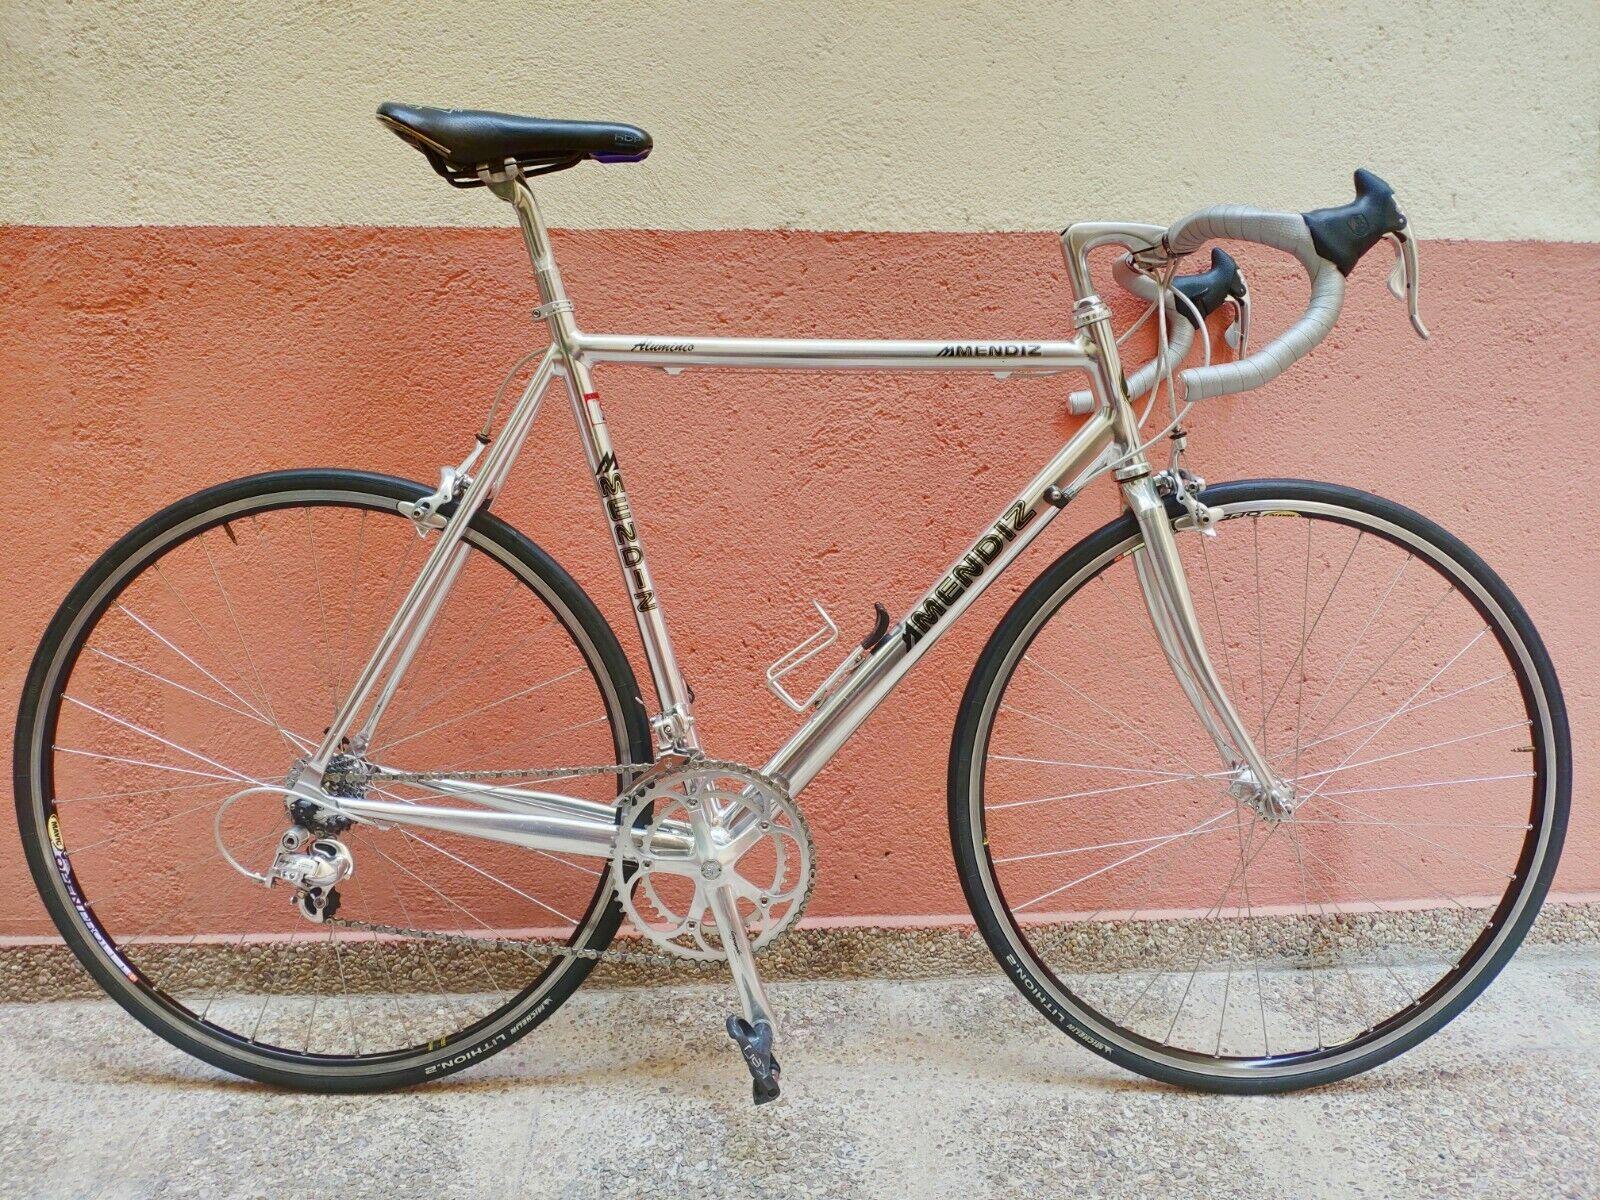 Vintage Mendiz road bike with Campagnolo Chorus/Athena groupset